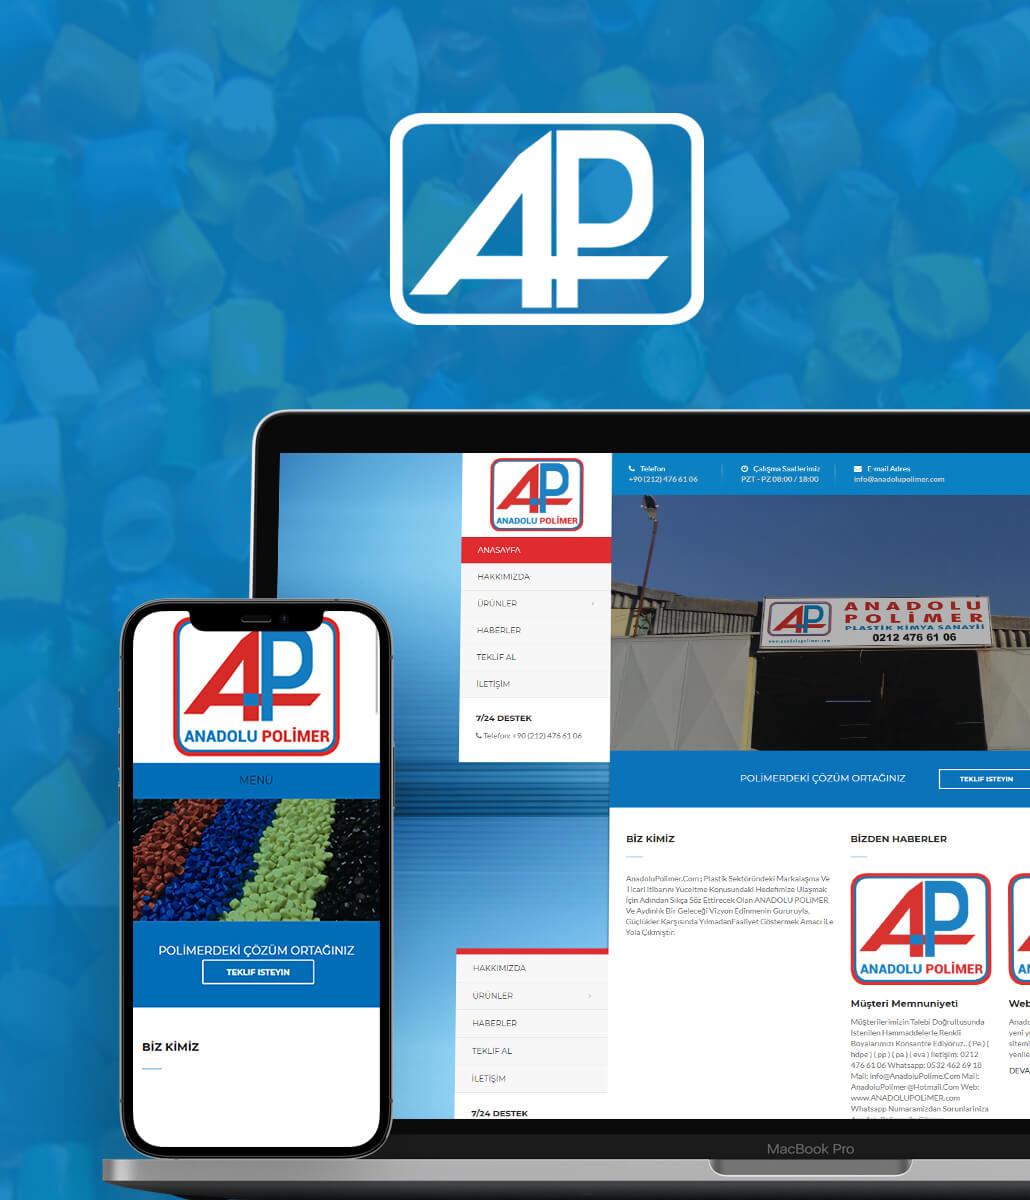 Anadolu Polimer Kurumsal Web Sitesi